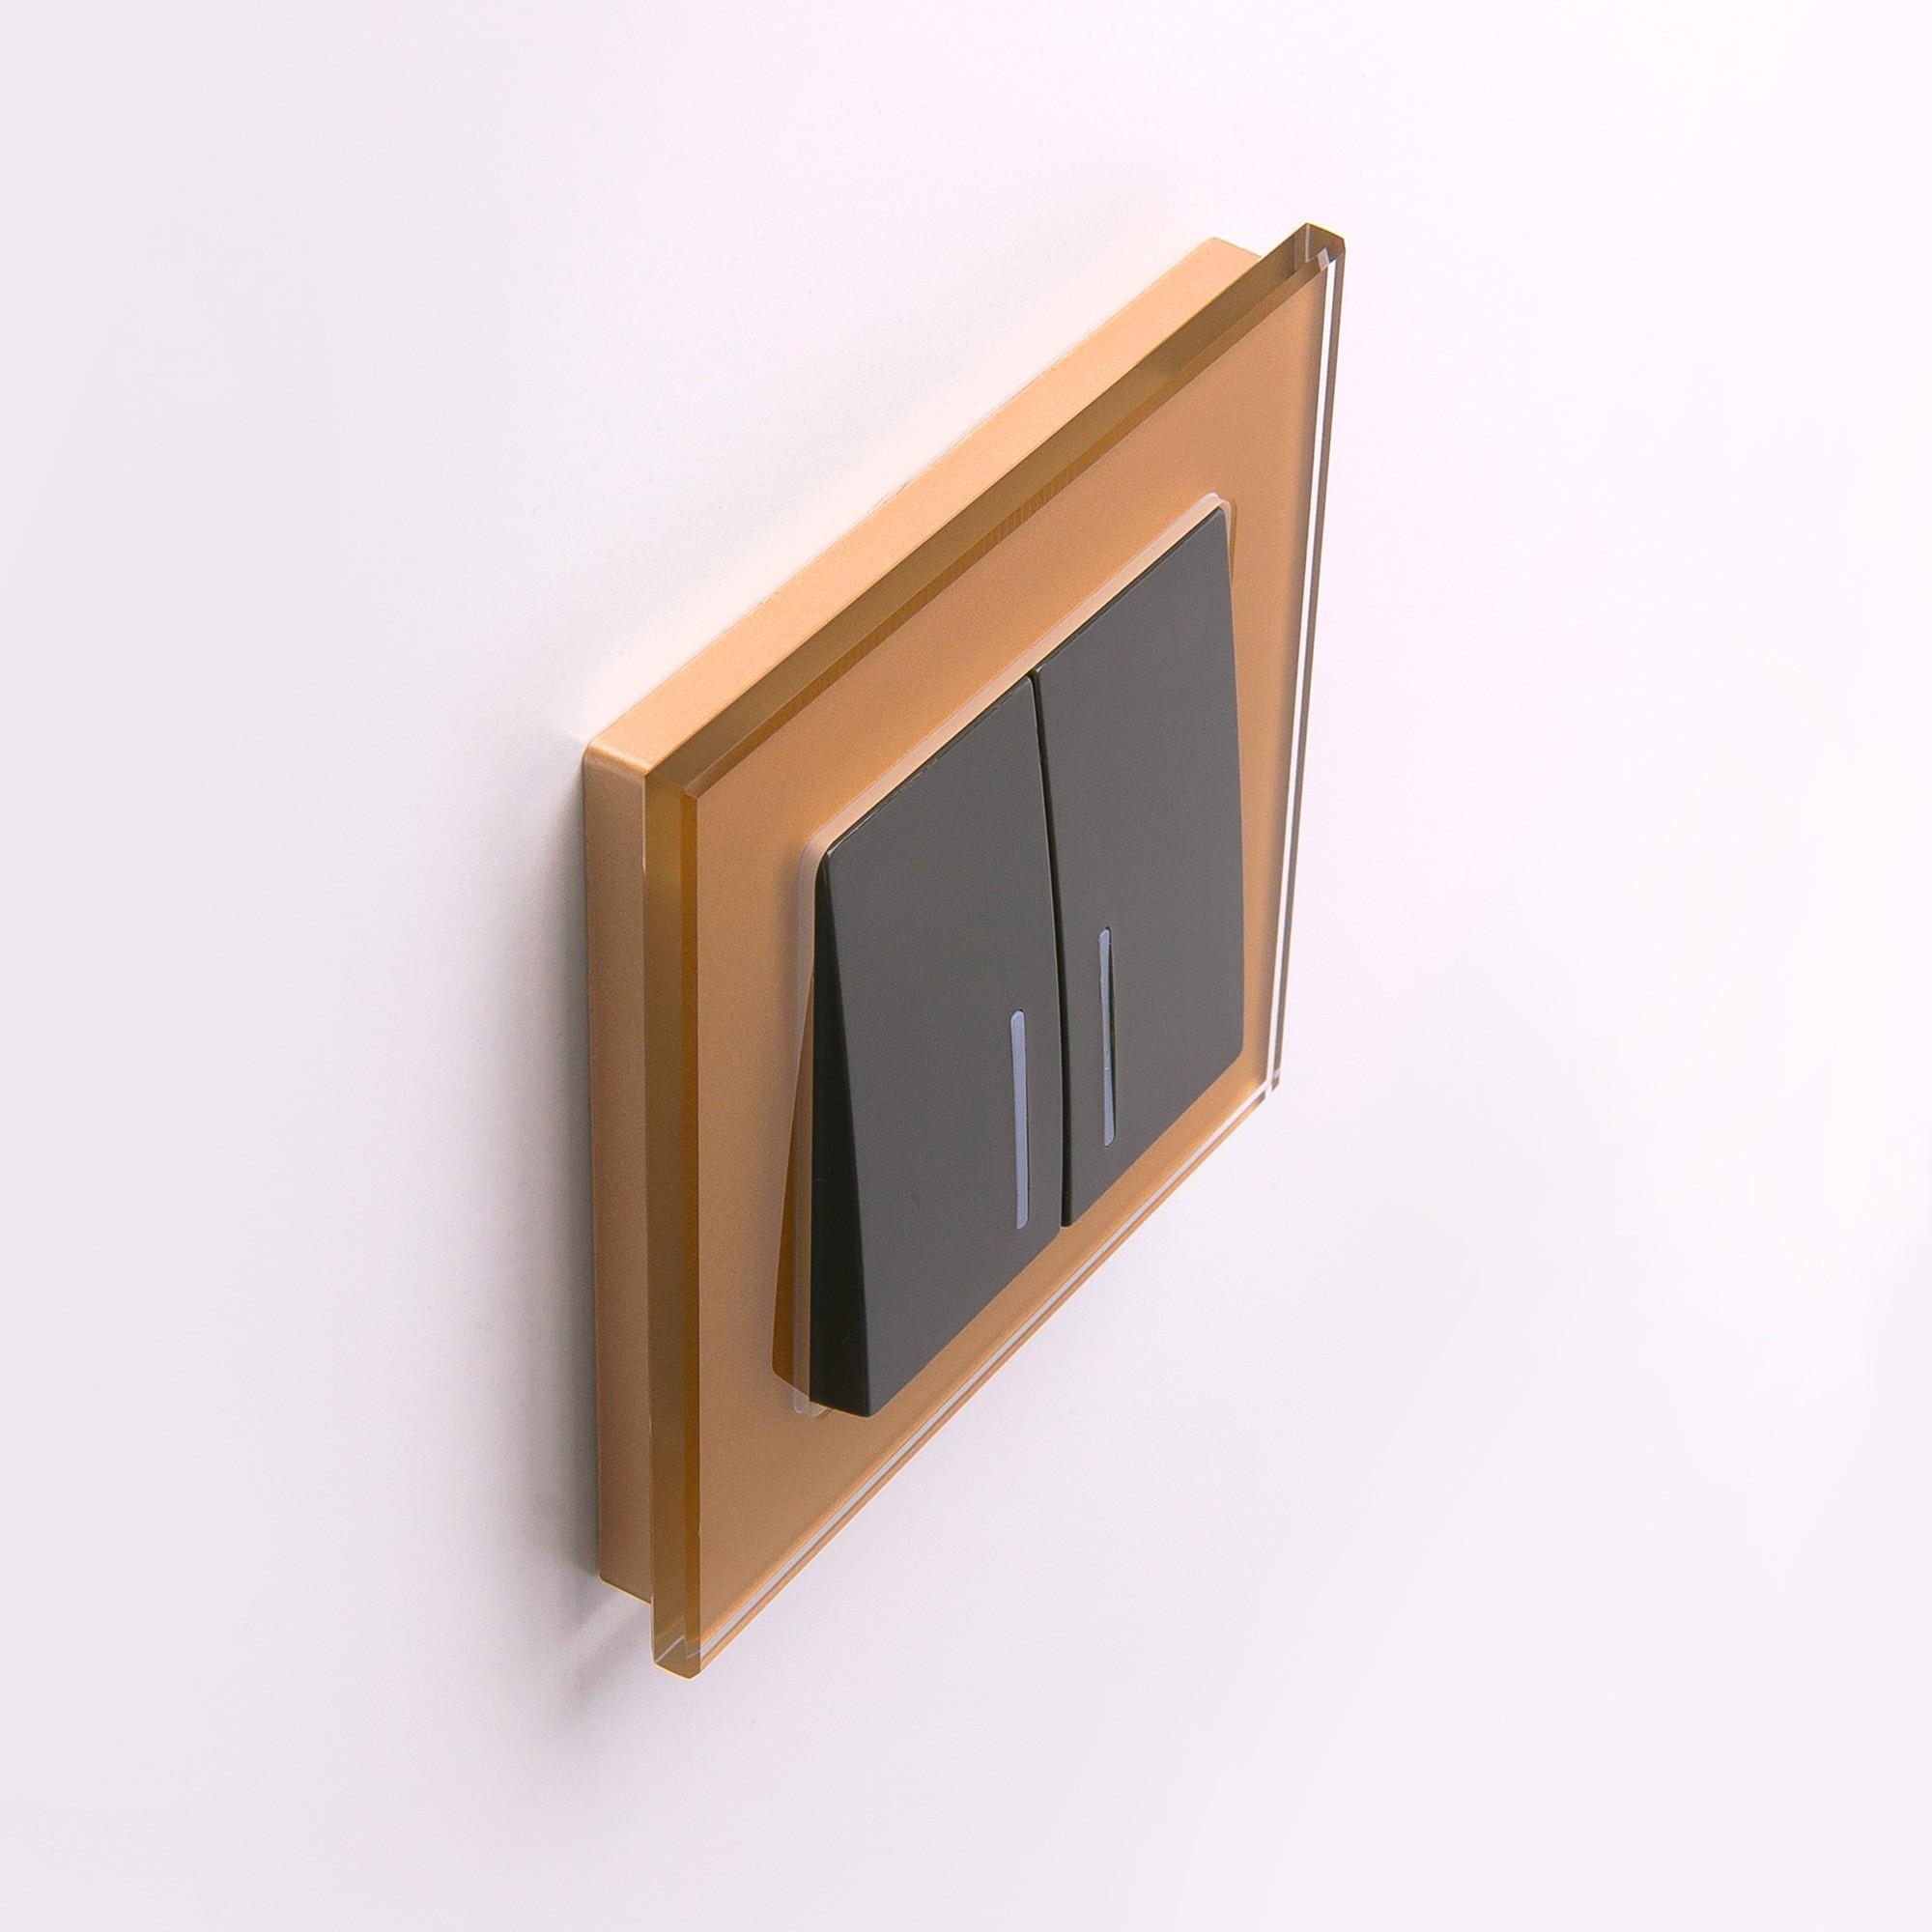 WL01-Frame-01 / Рамка на 1 пост (бронзовый,стекло)